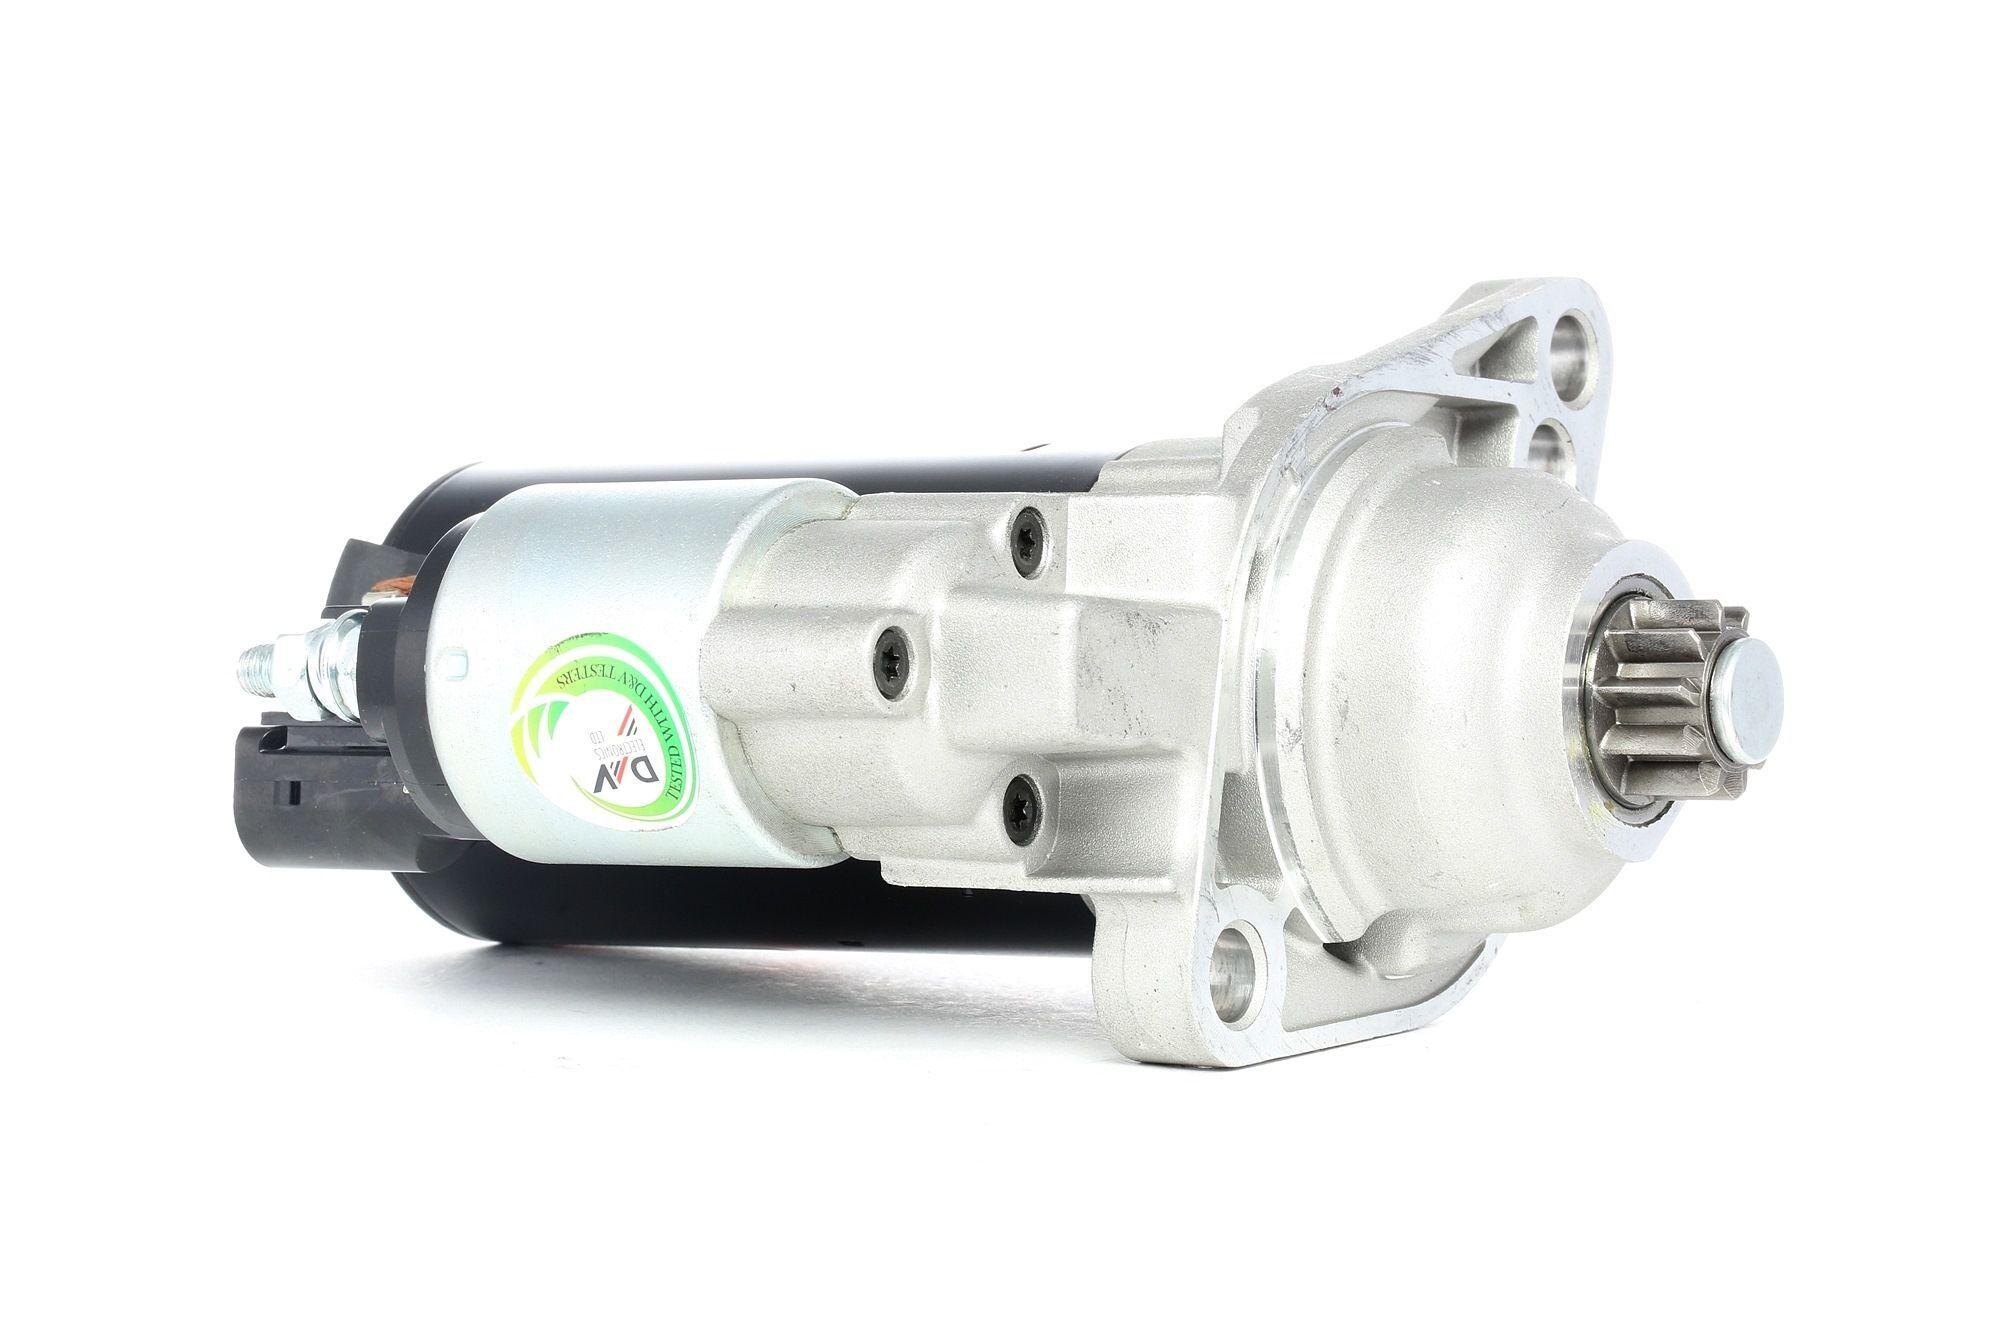 AS-PL Starttimoottori Brand new AS-PL Alternator 0120468028 S0090 Startti,Käynnistinmoottori VW,SEAT,SKODA,GOLF IV 1J1,GOLF V 1K1,POLO 9N_